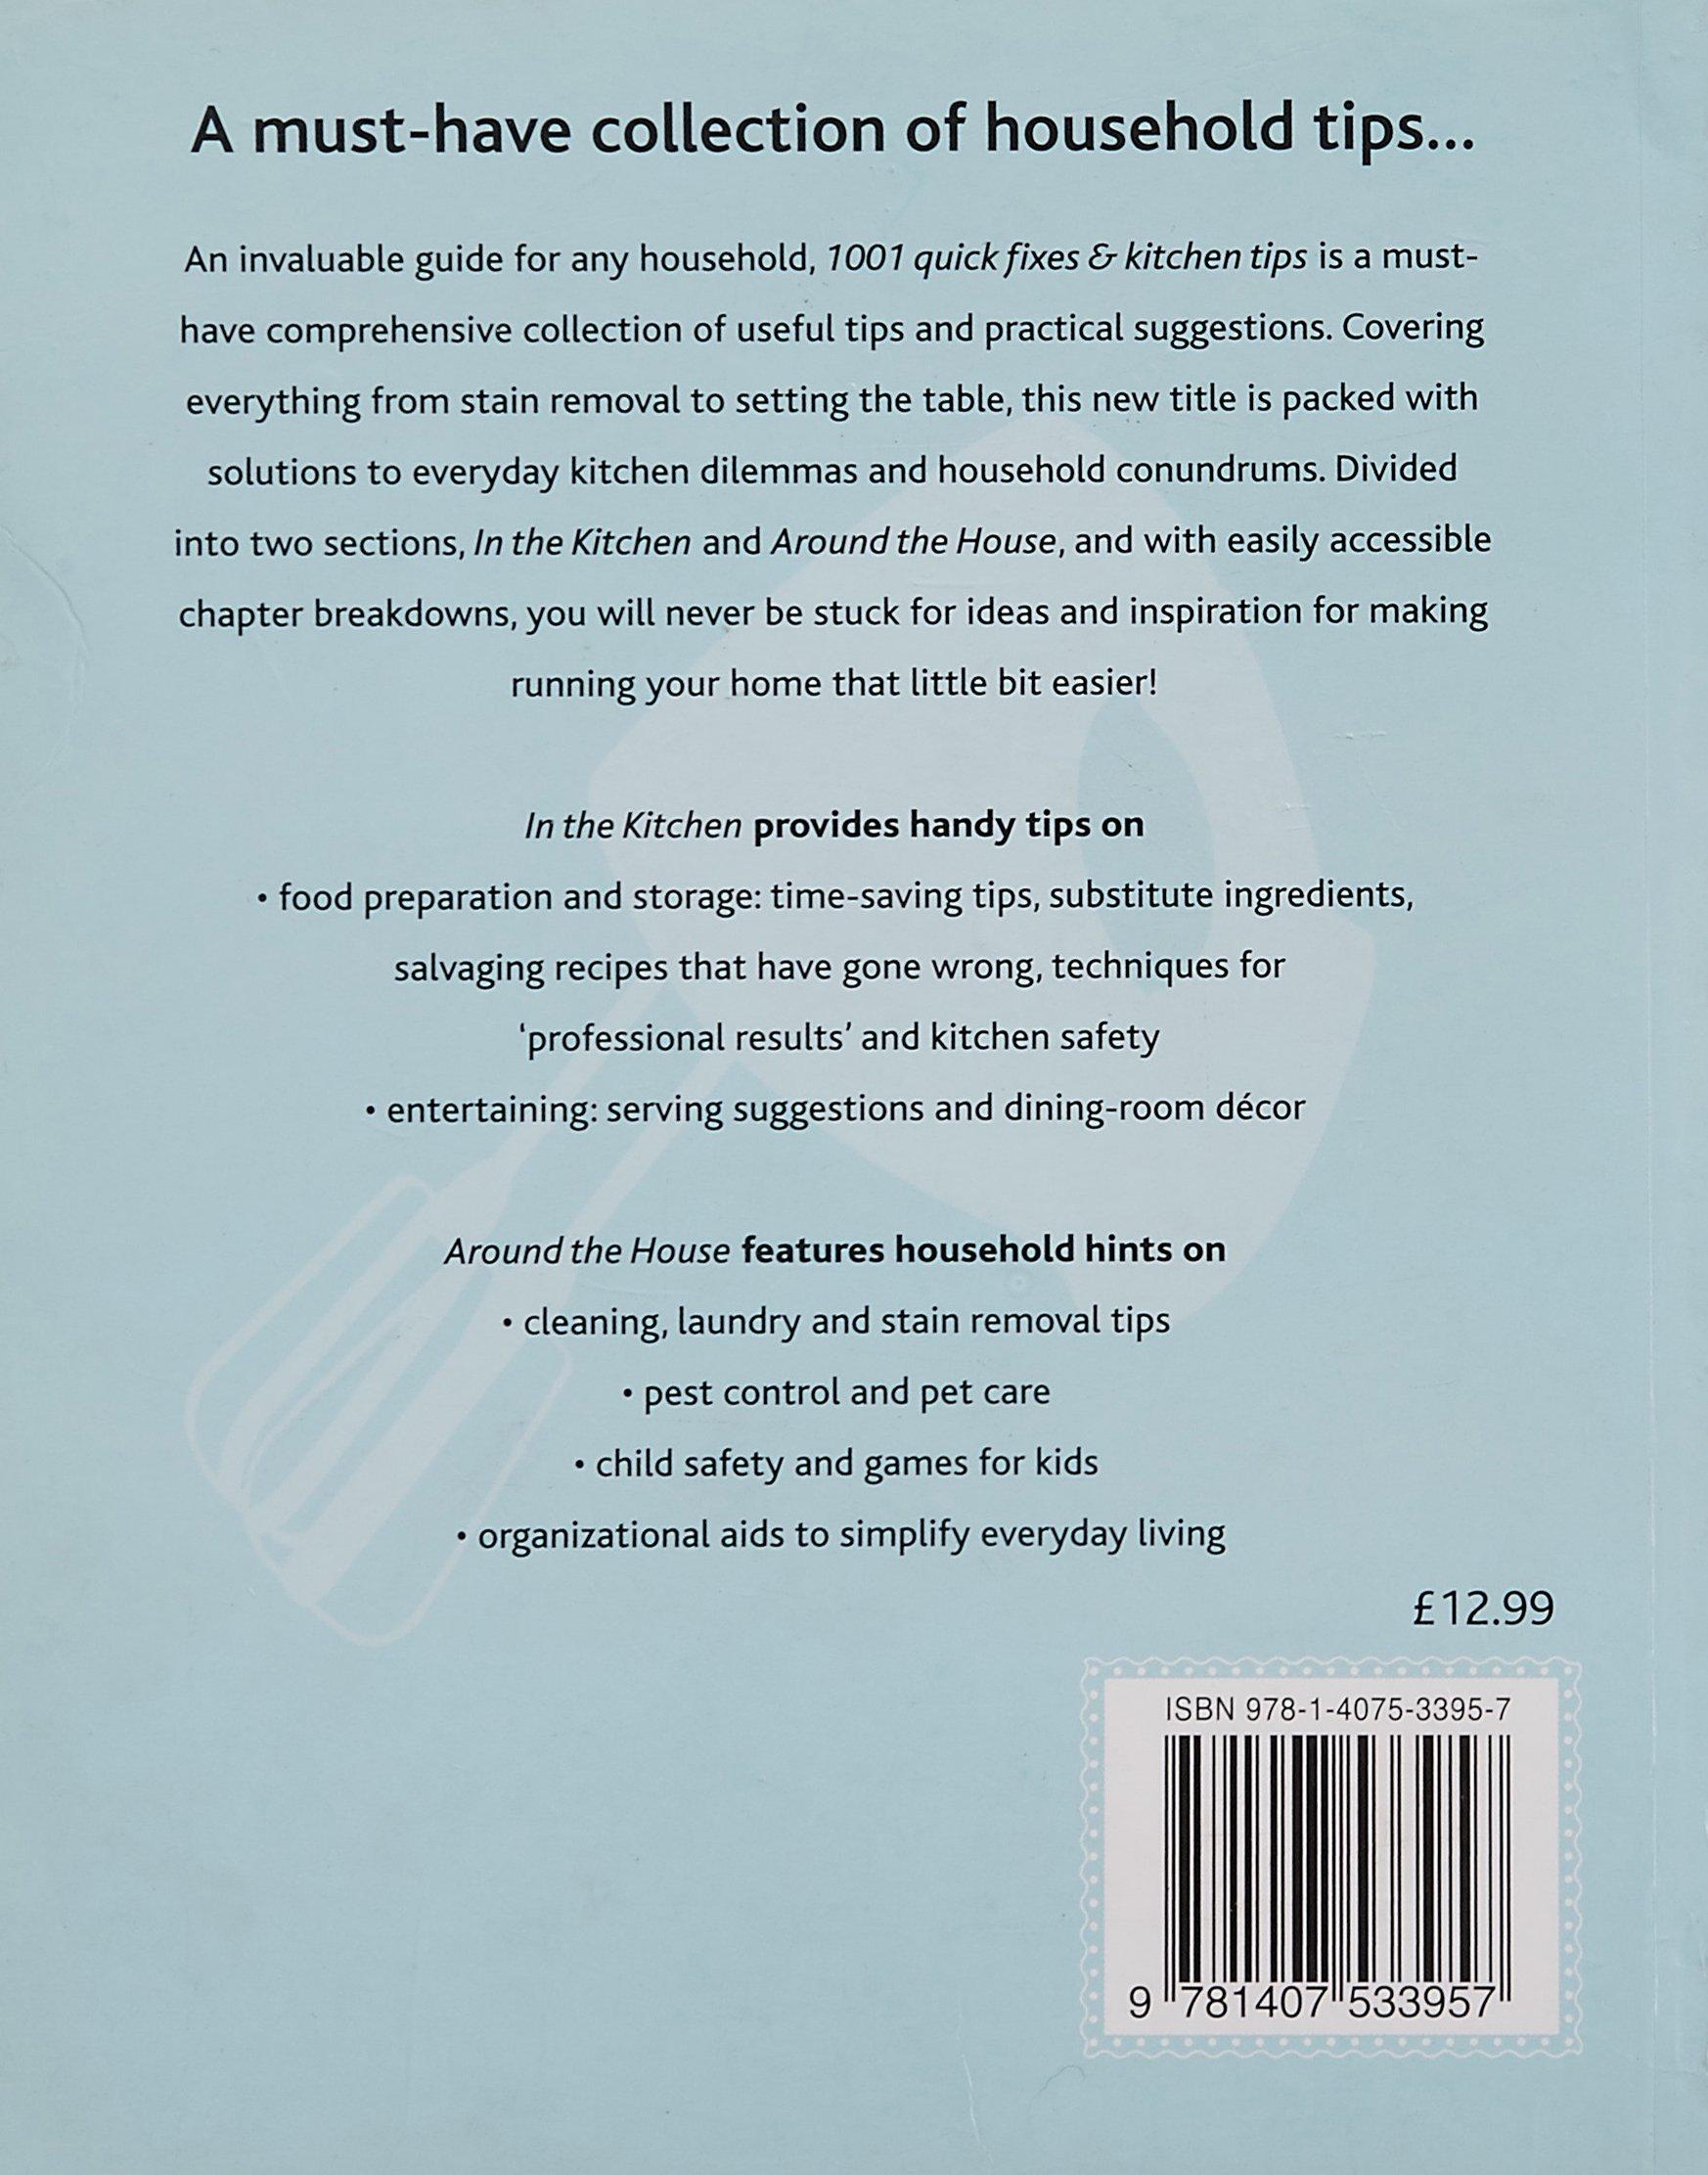 1001 Quick Fixes and Kitchen Tips: Parragon: 9781407533957: Amazon ...